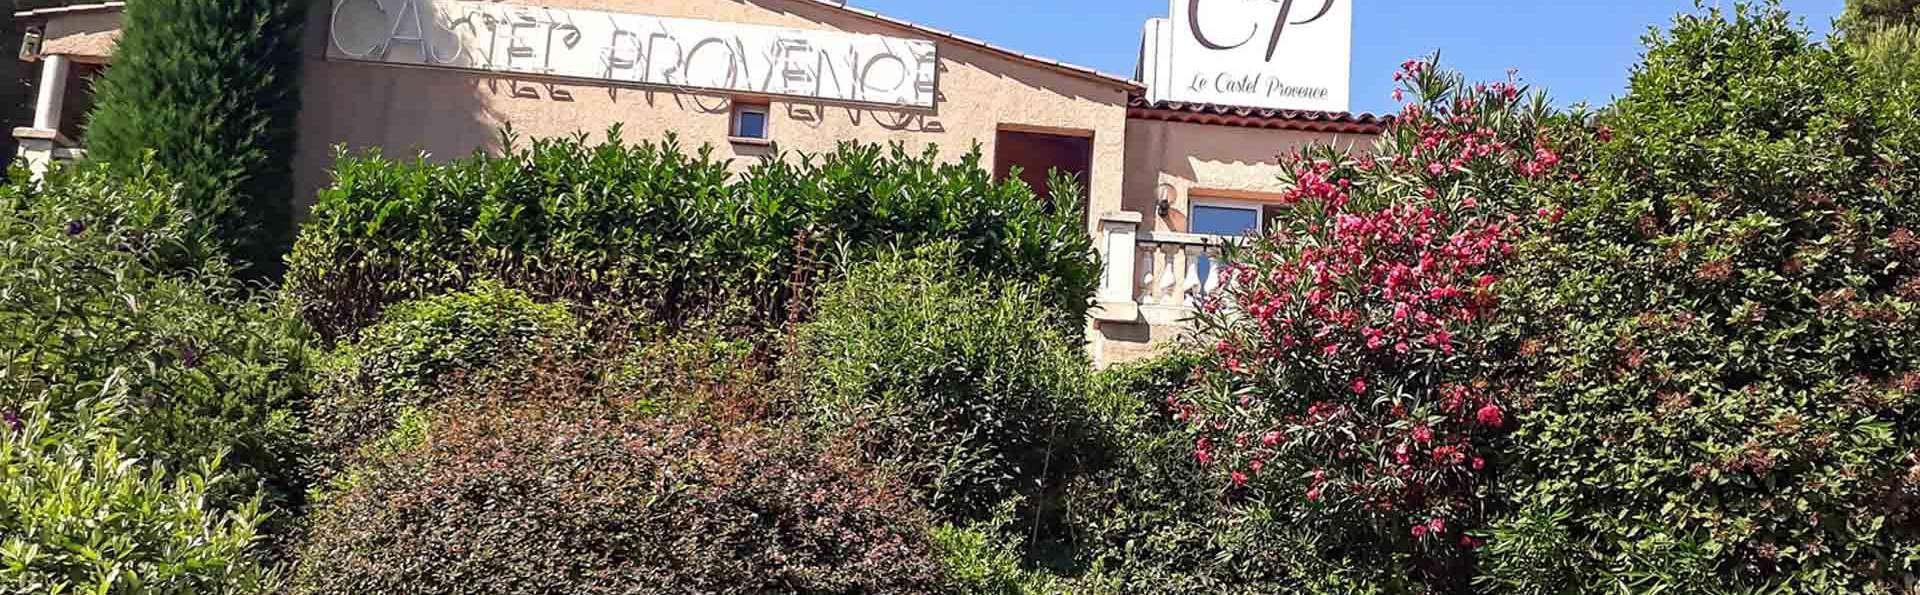 Castel Provence - EDIT_Entree.jpg